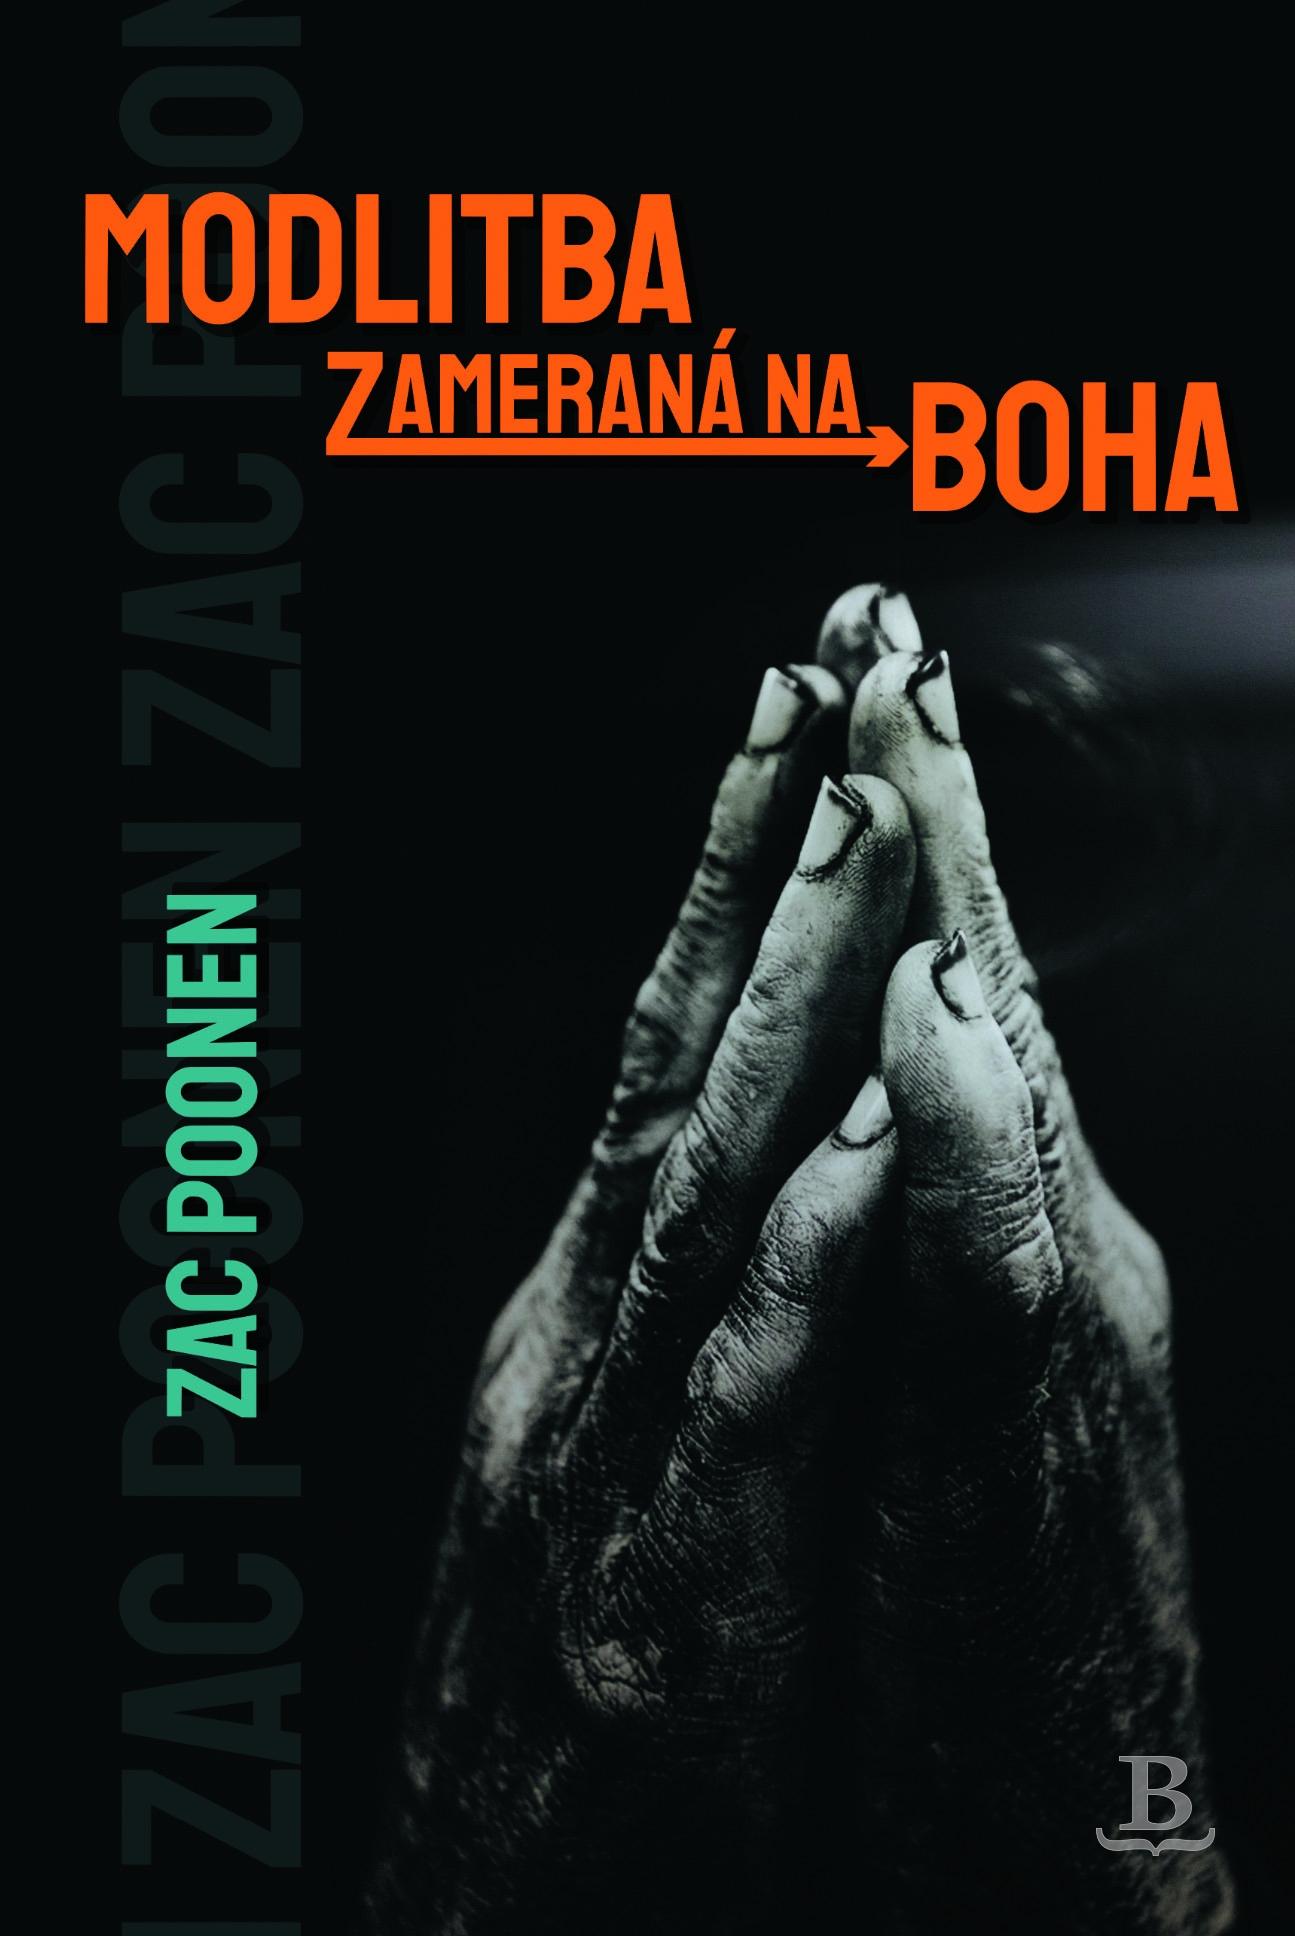 Modlitba zameraná na Boha